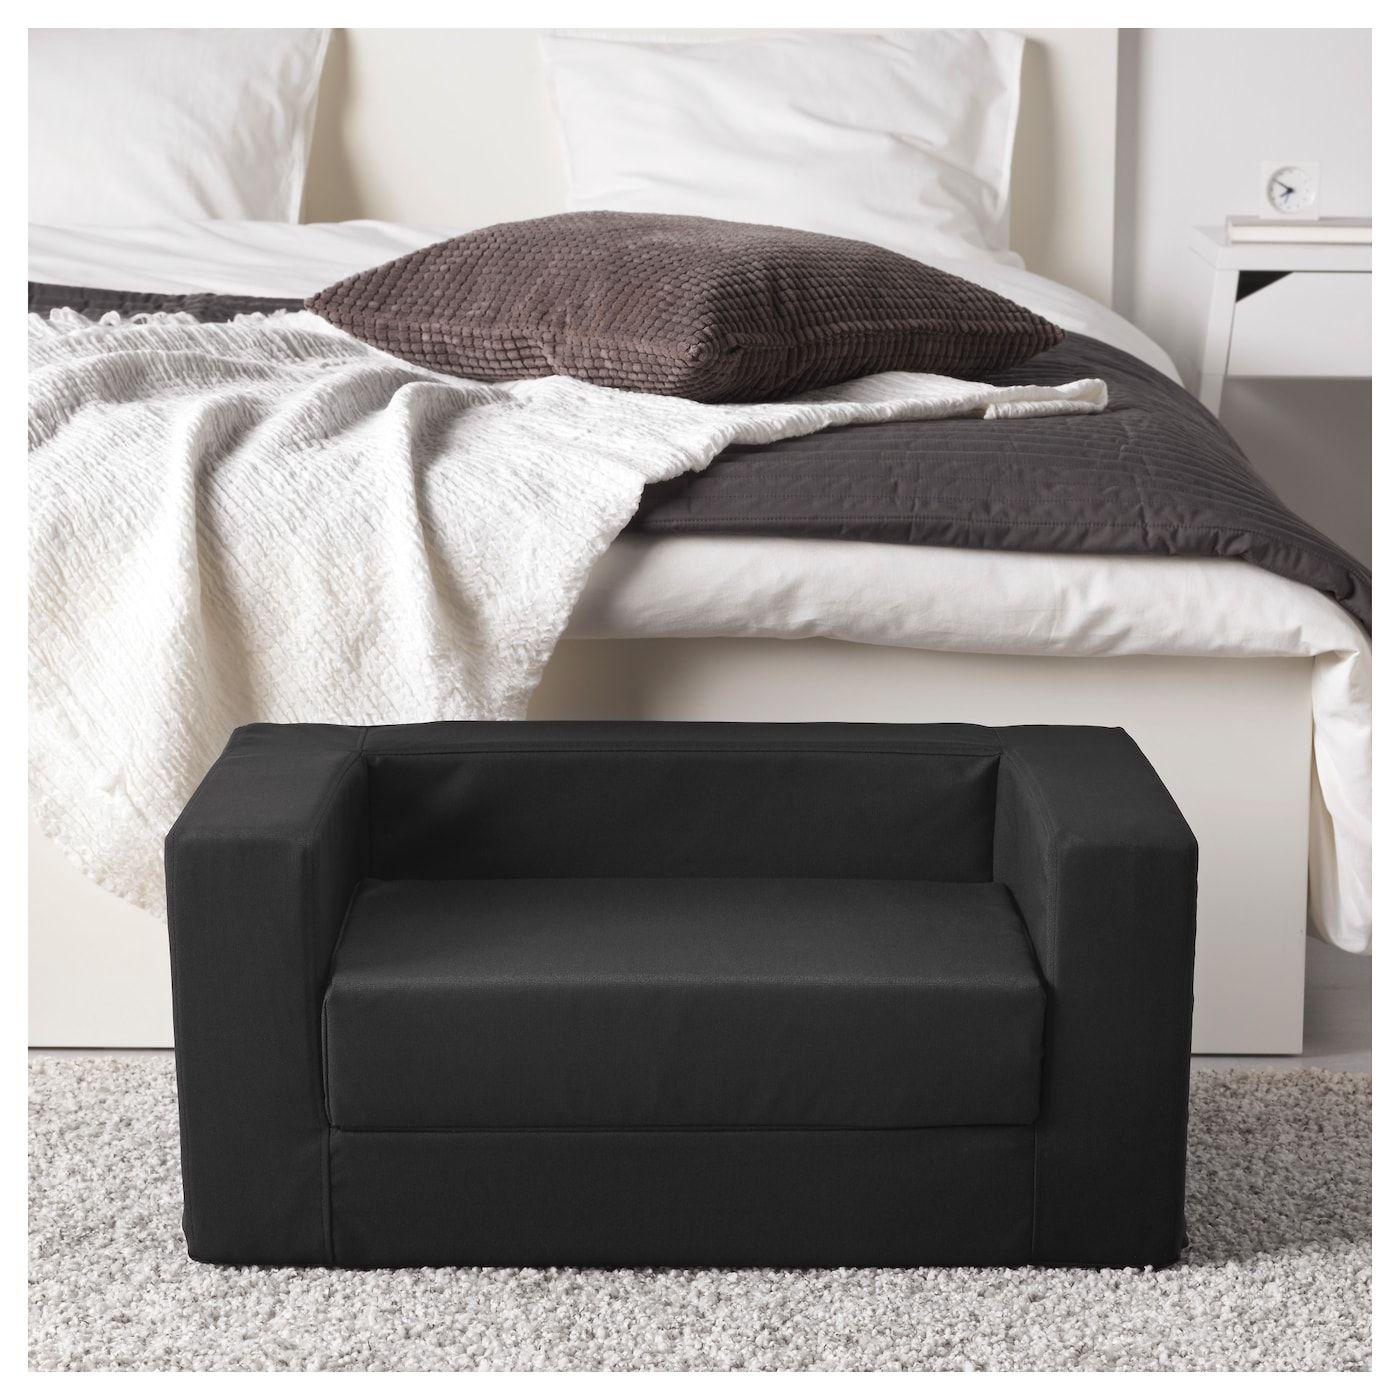 IKEA LURVIG Cat/dog bed Dog bed, Black bedding, Ikea bed